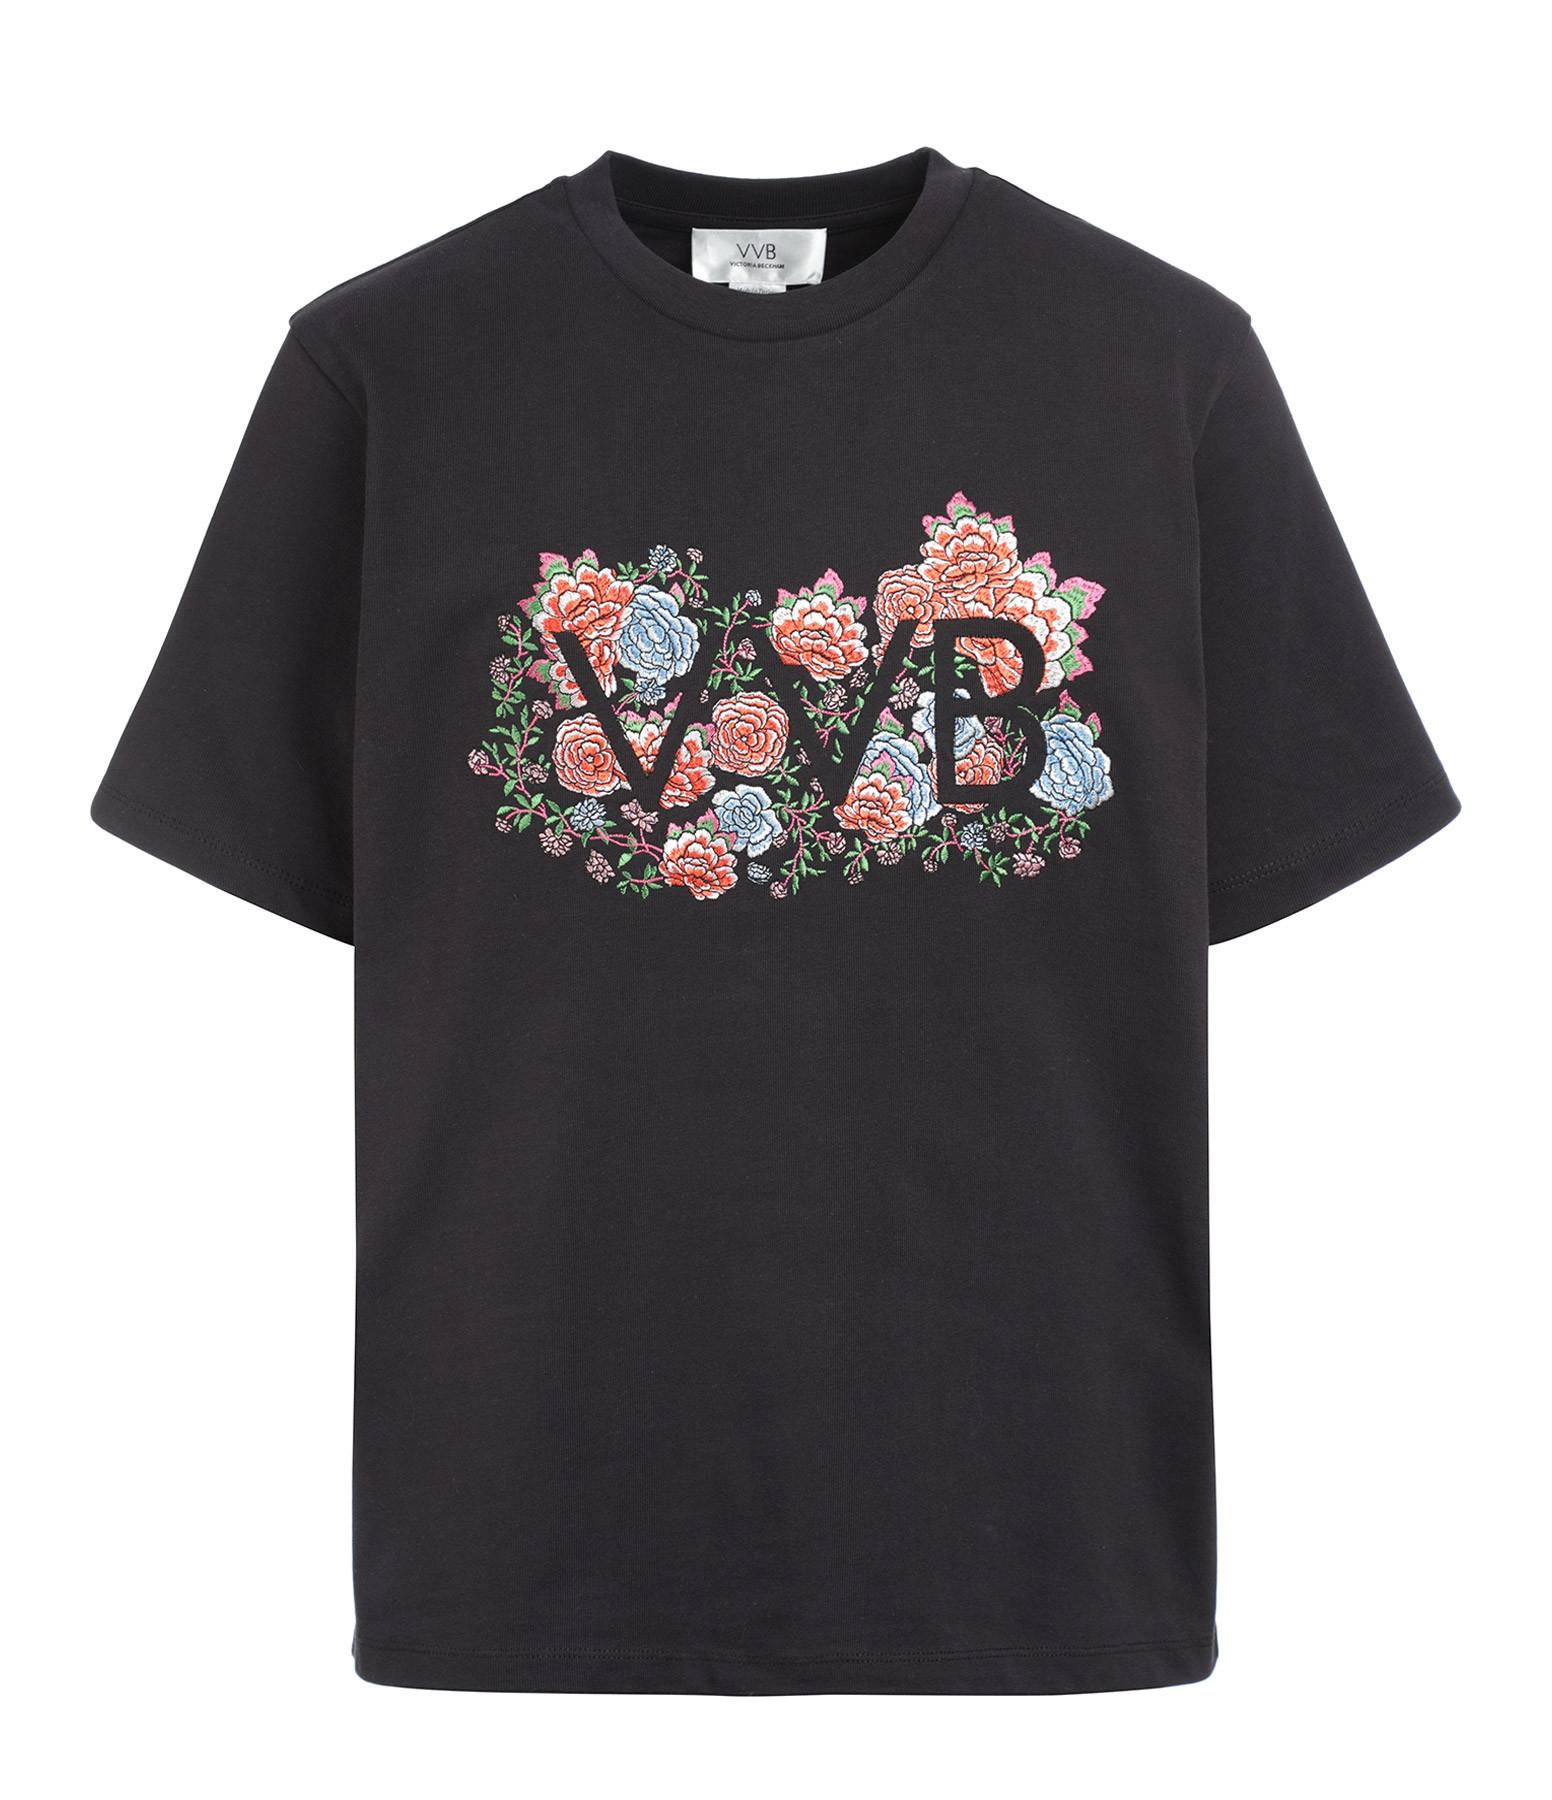 VICTORIA VICTORIA BECKHAM - Tee-shirt Logo Floral Noir